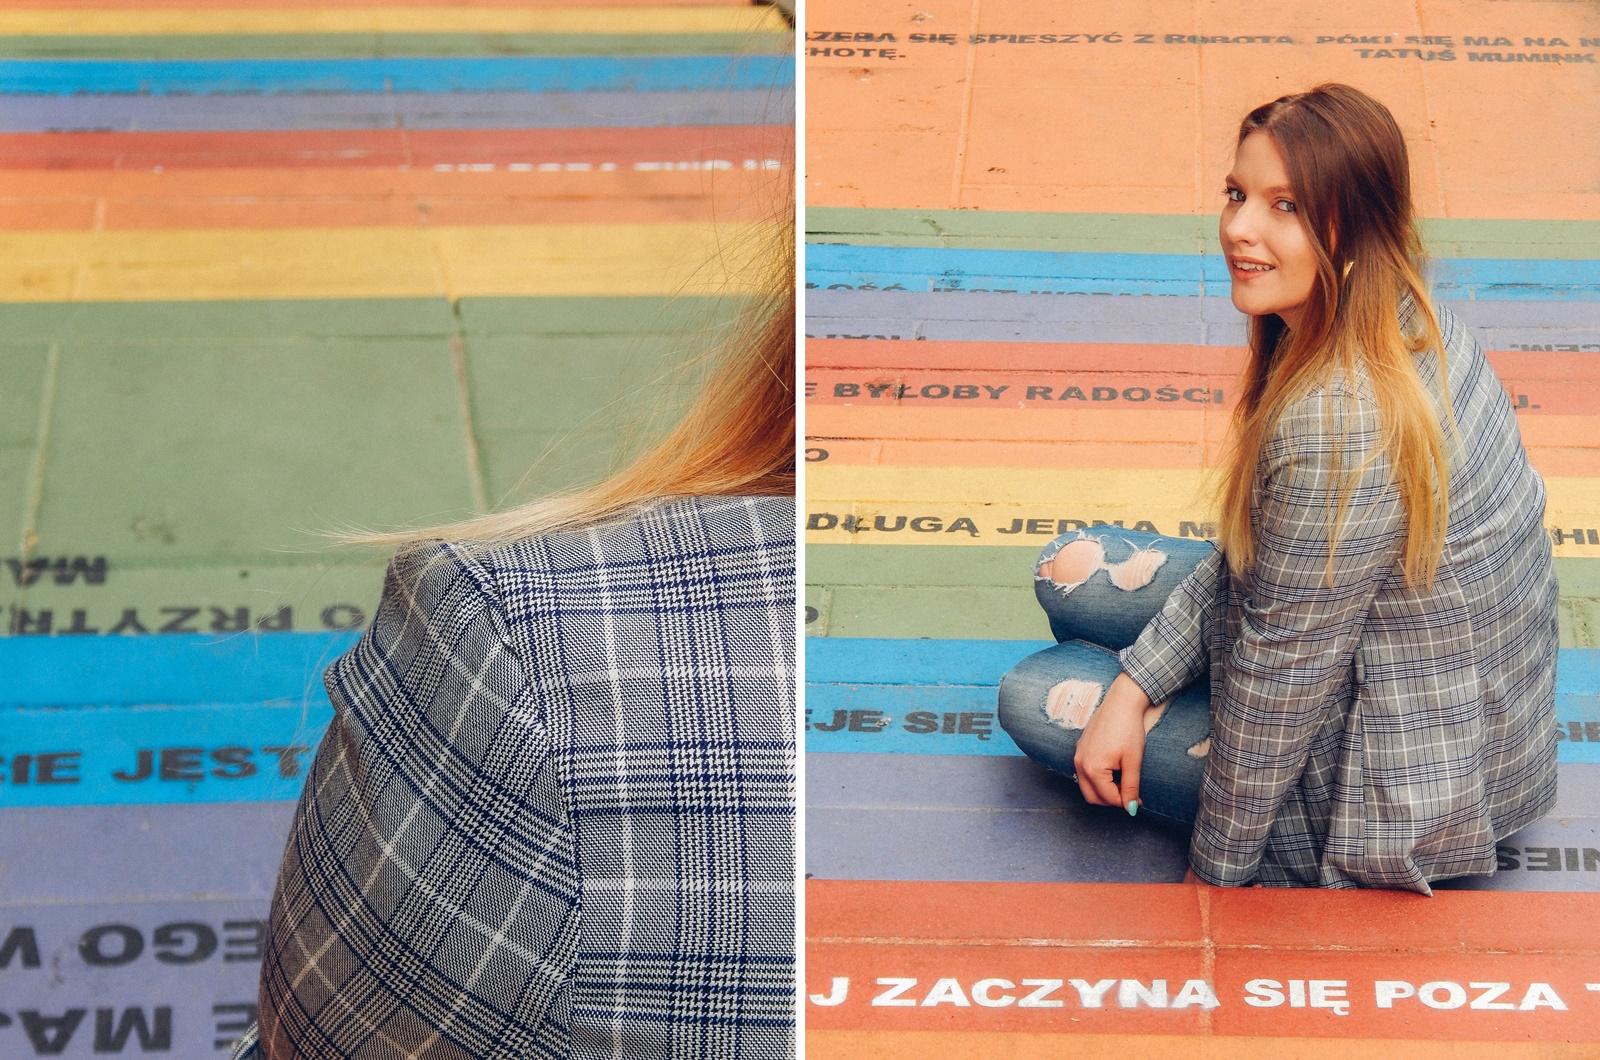 8a nakd zniżka outfit moda blog modowy jak nosić marynarkę w kratkę tshirt z kaktusem jak nosić podarte jeansy vansy moda streetwear style fashion outfit blog lifestyle łódź